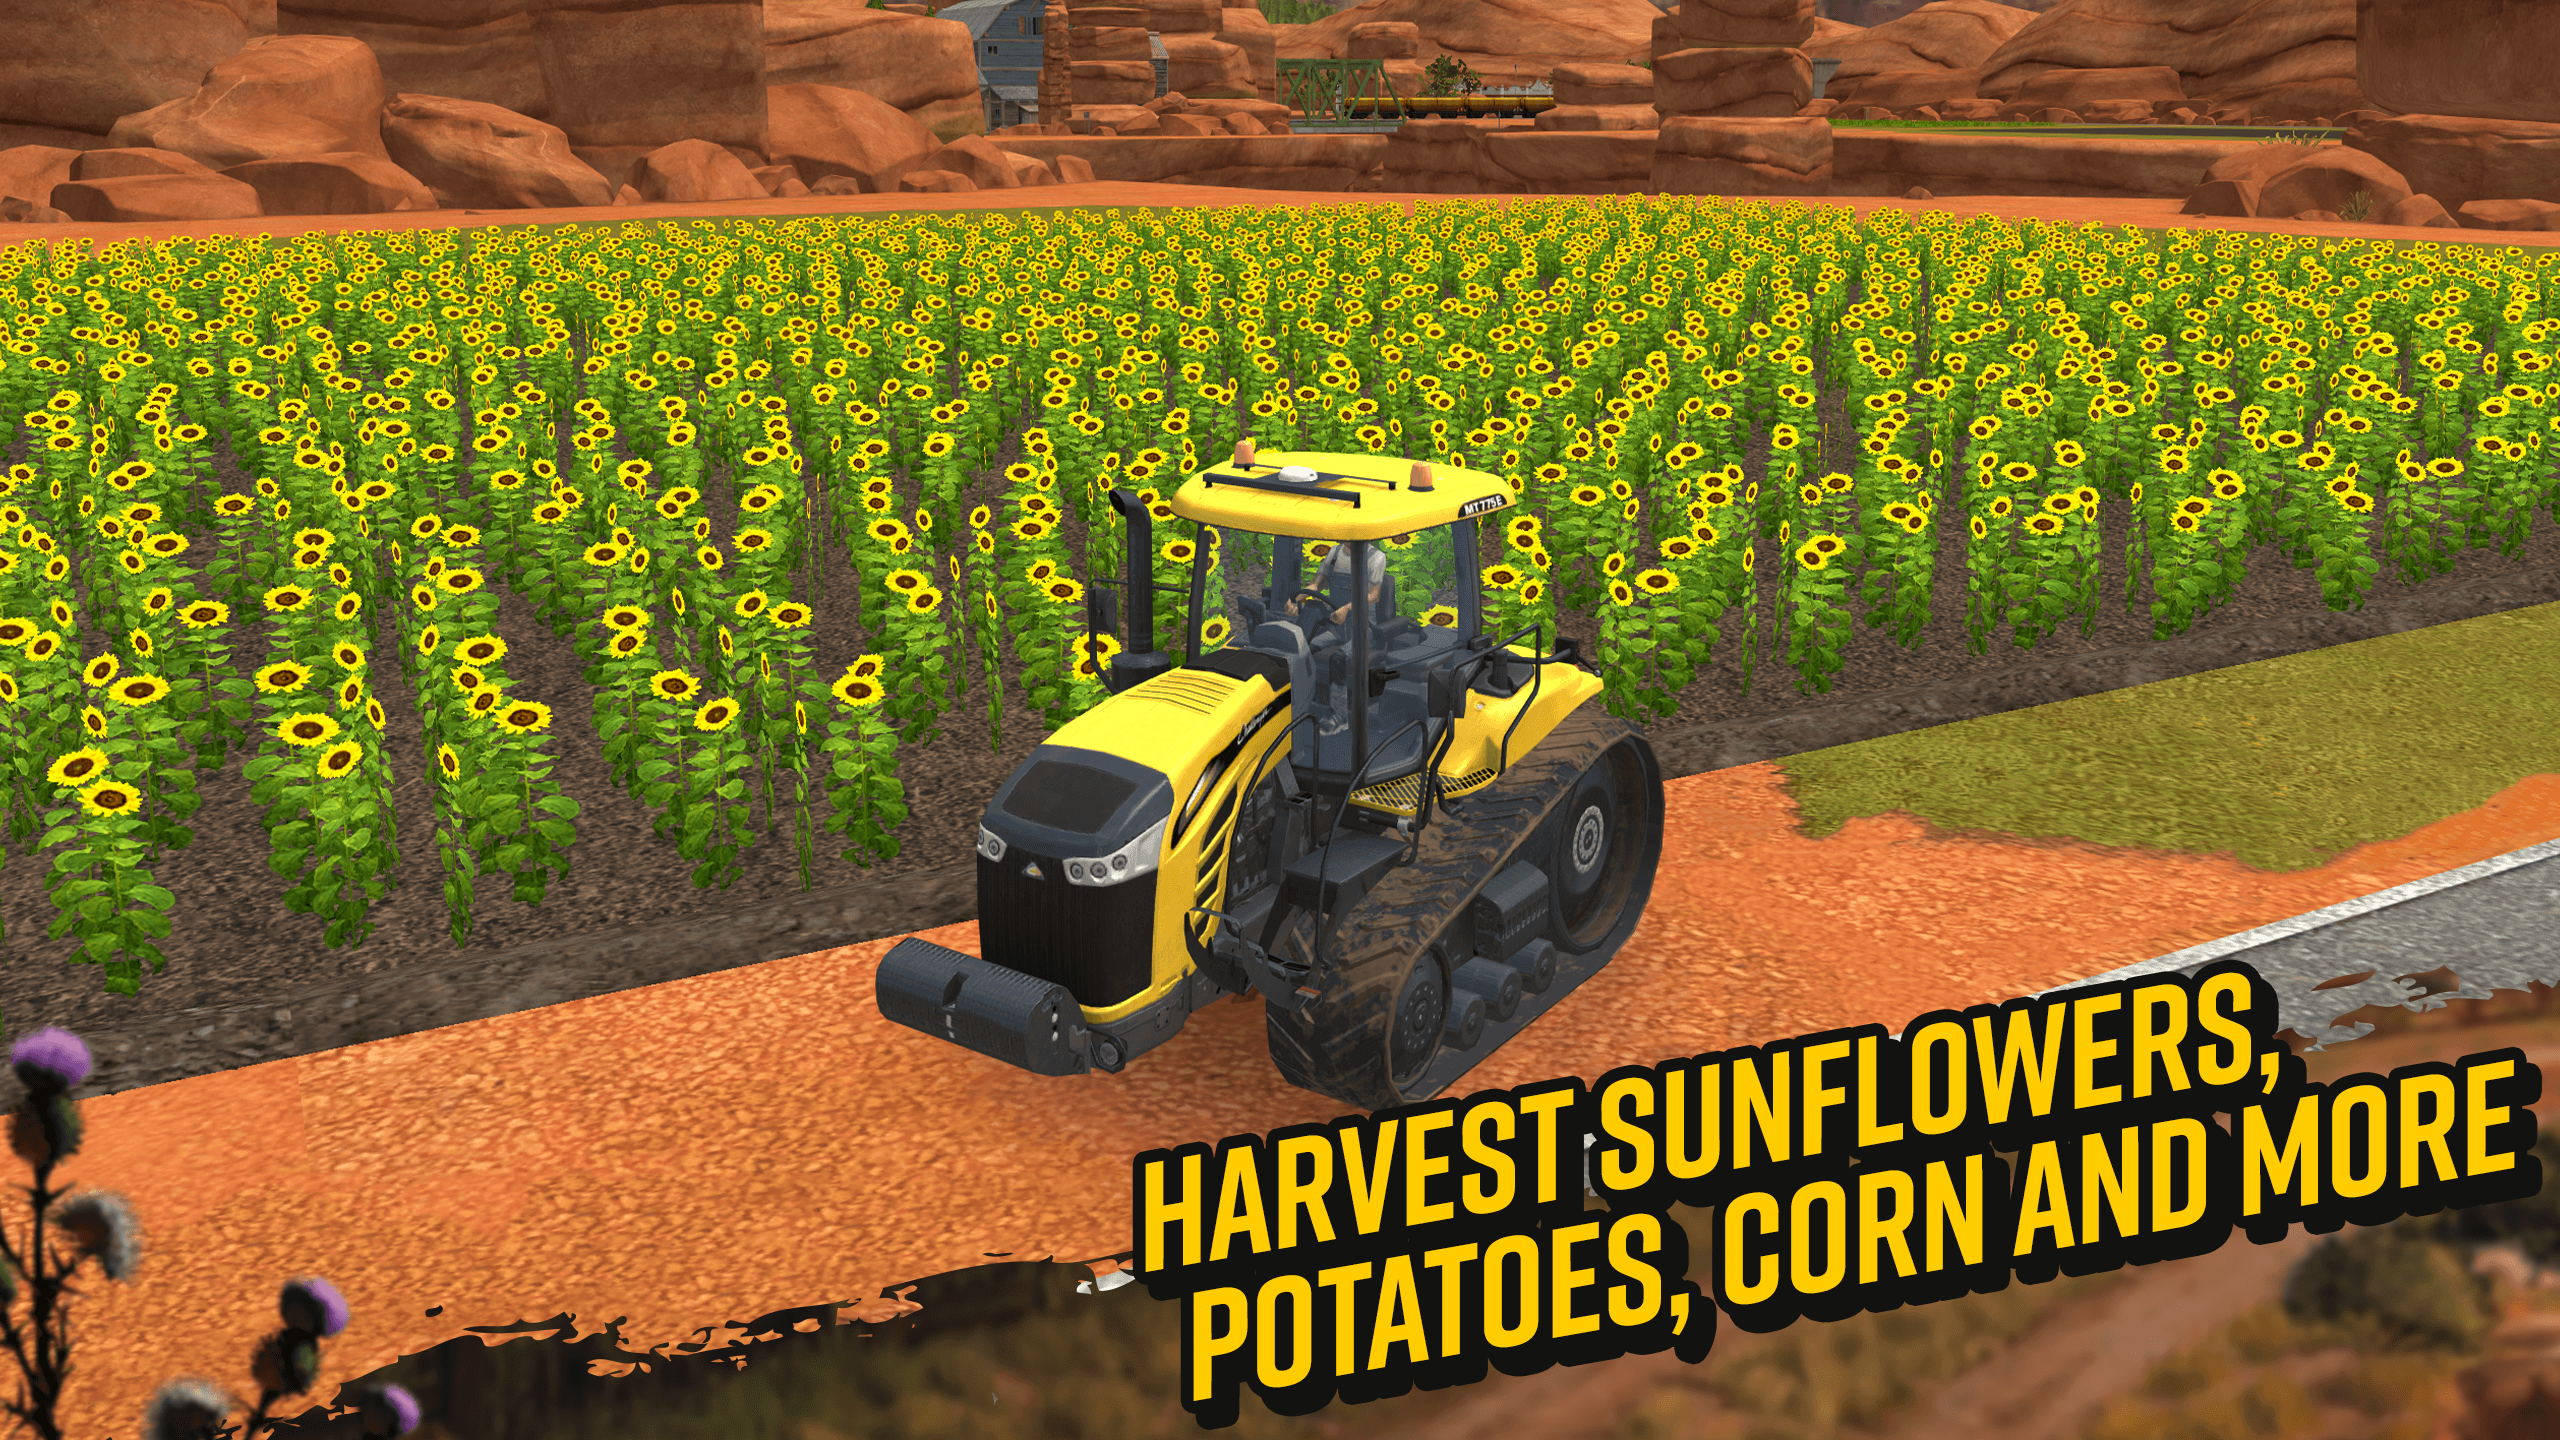 farming simulator 2018 free download full version pc